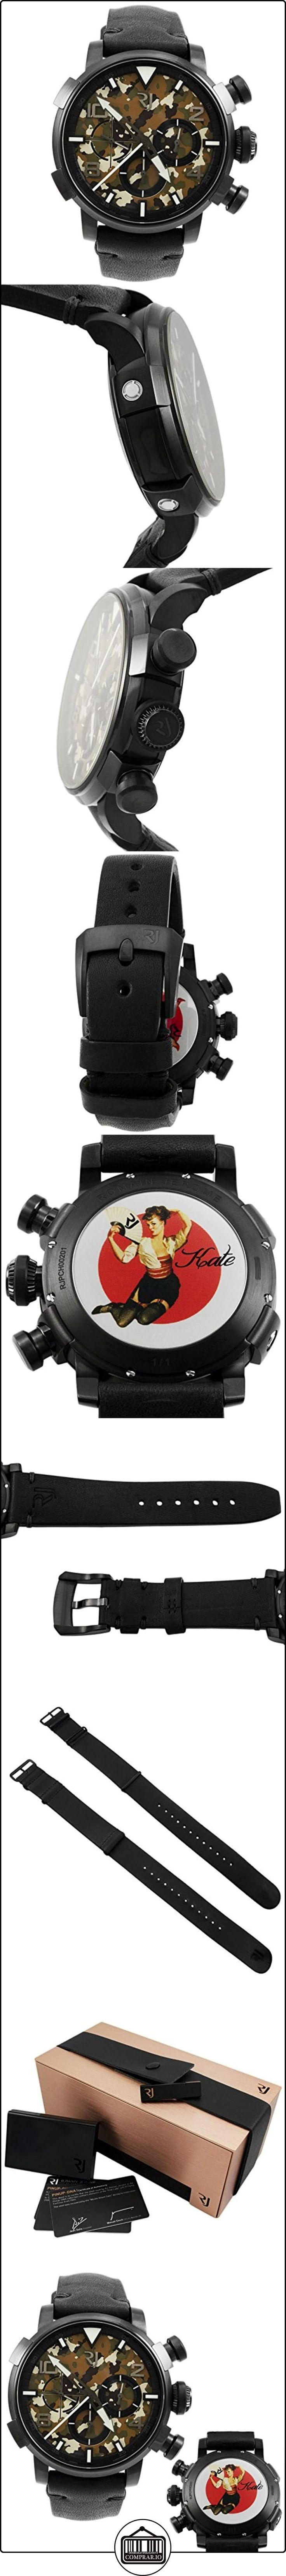 Romain Jerome Pinup ADN negro WWII Kate Ventilador Cronógrafo Automático de los hombres reloj RJ. P. CH. 002.01 de  ✿ Relojes para hombre - (Lujo) ✿